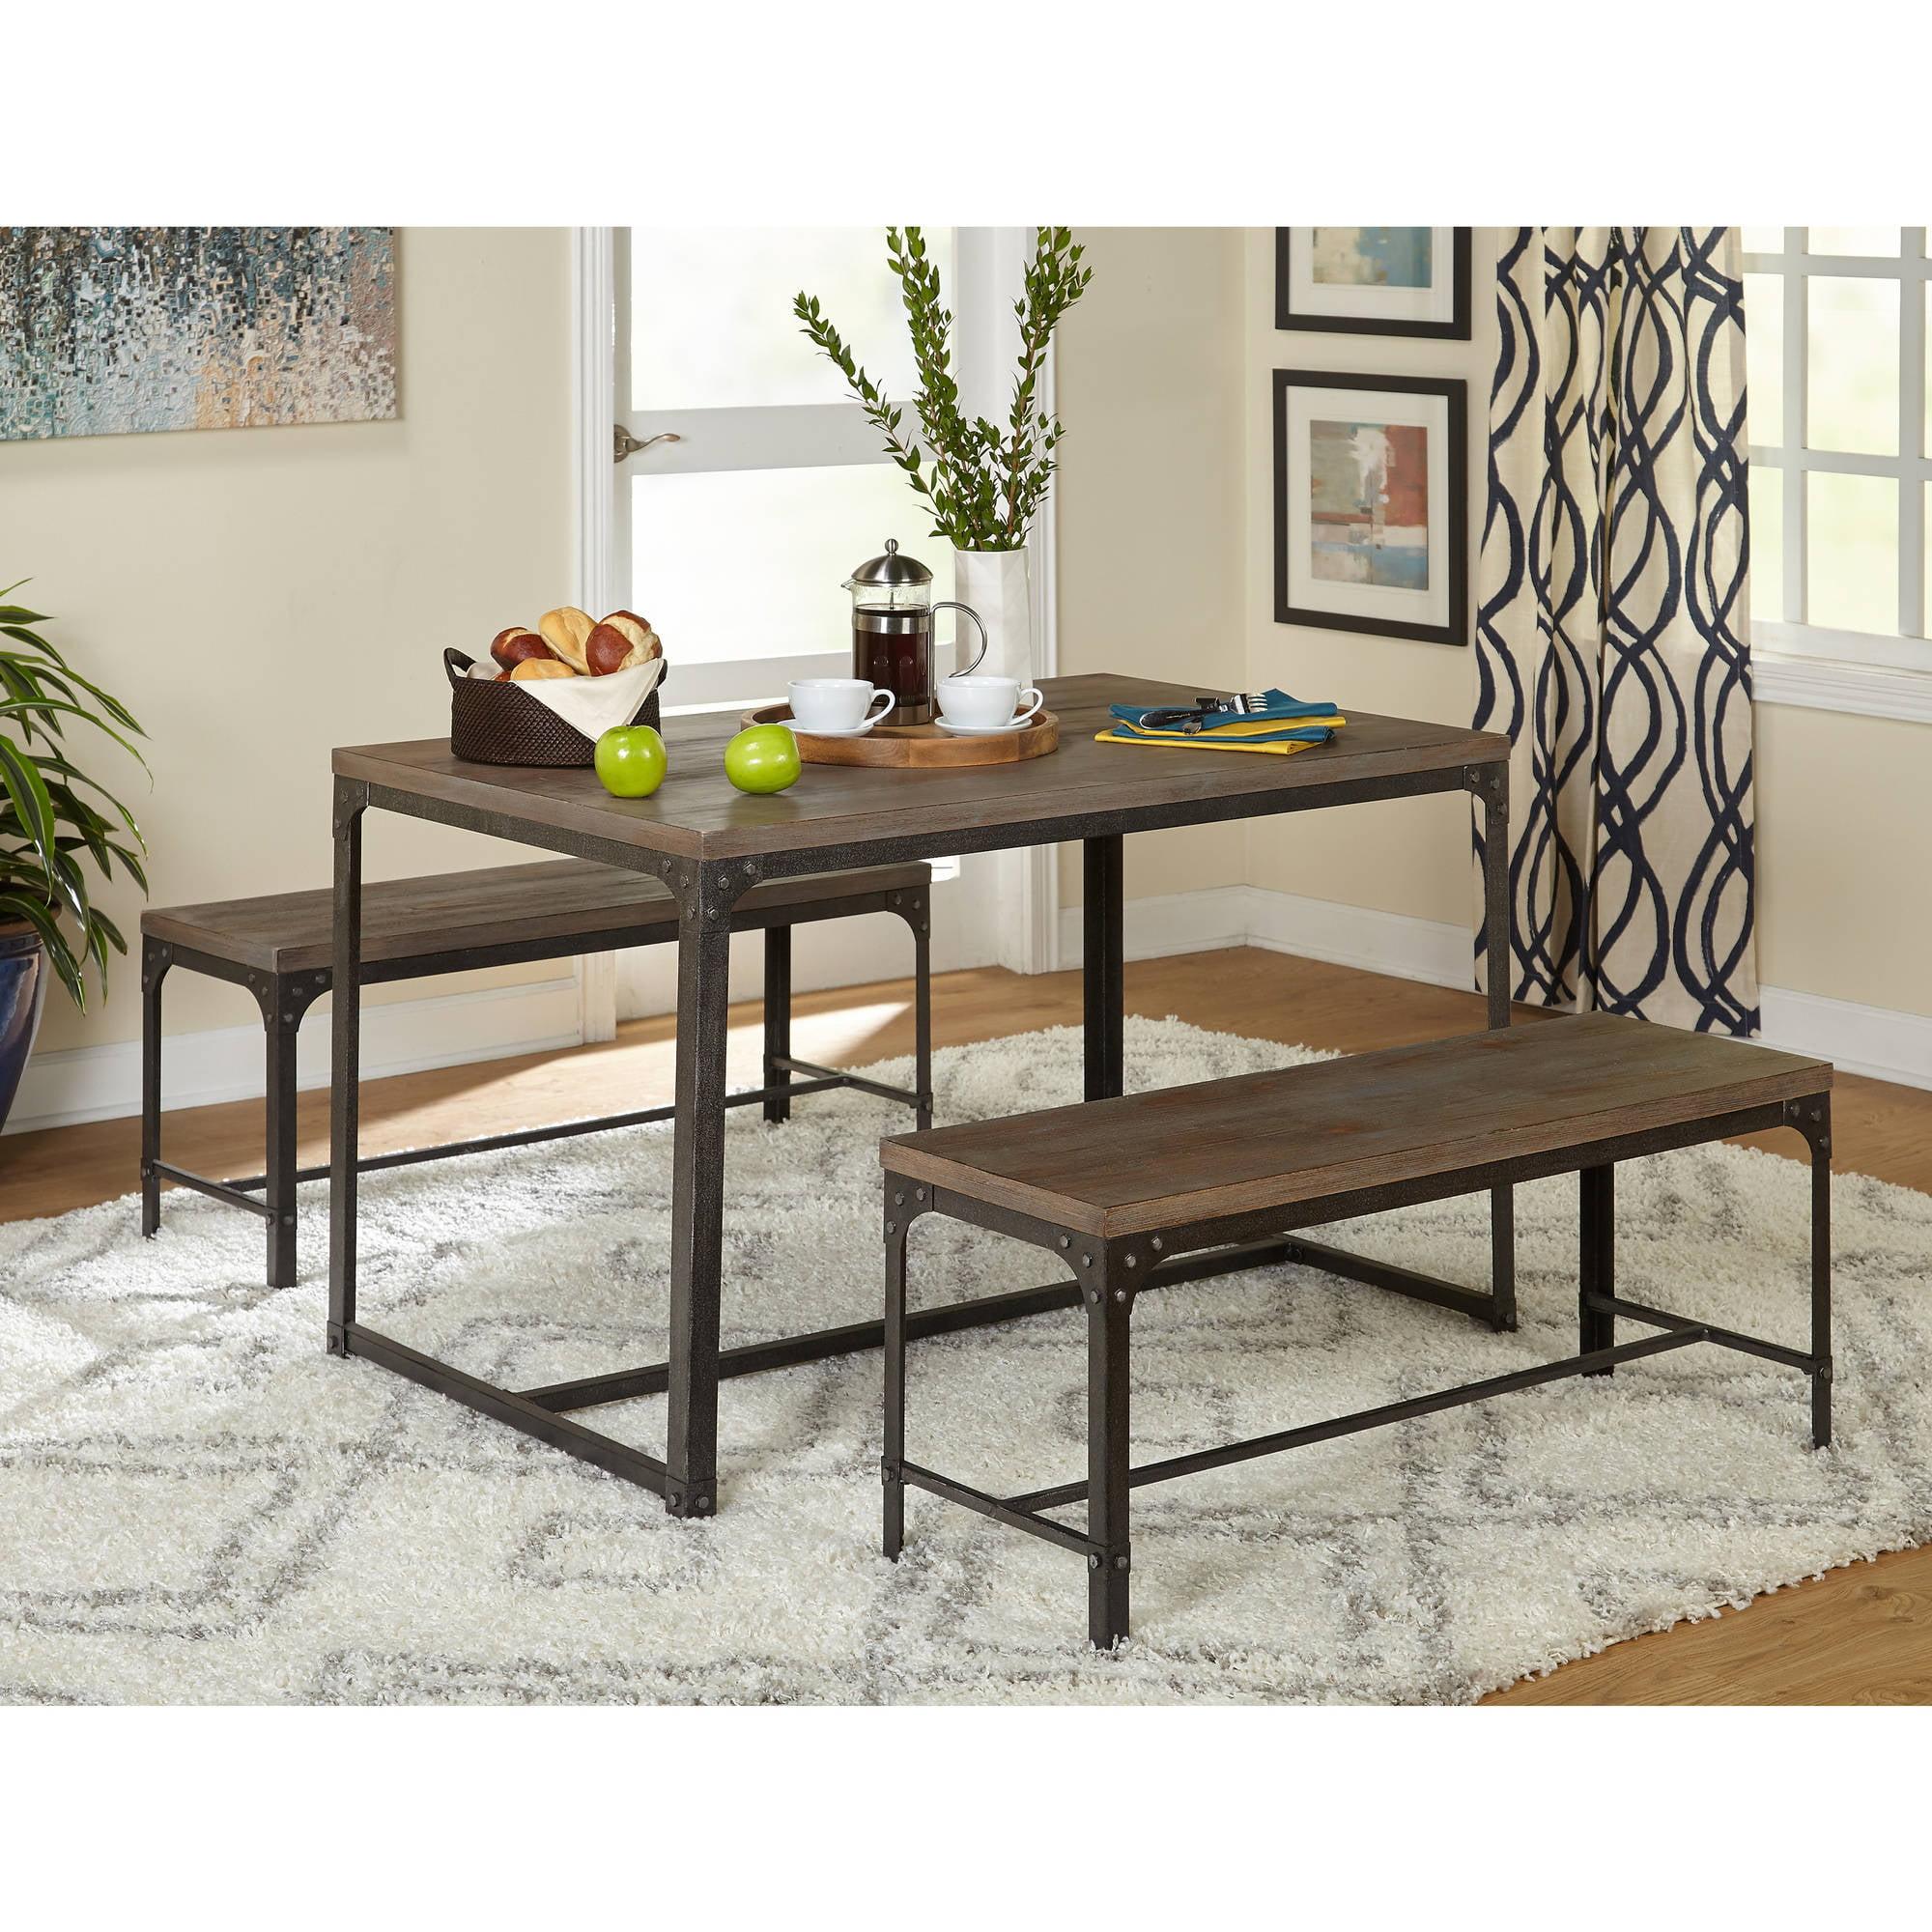 Scholar 3 Piece Table And Bench Set Gray Walmart Com